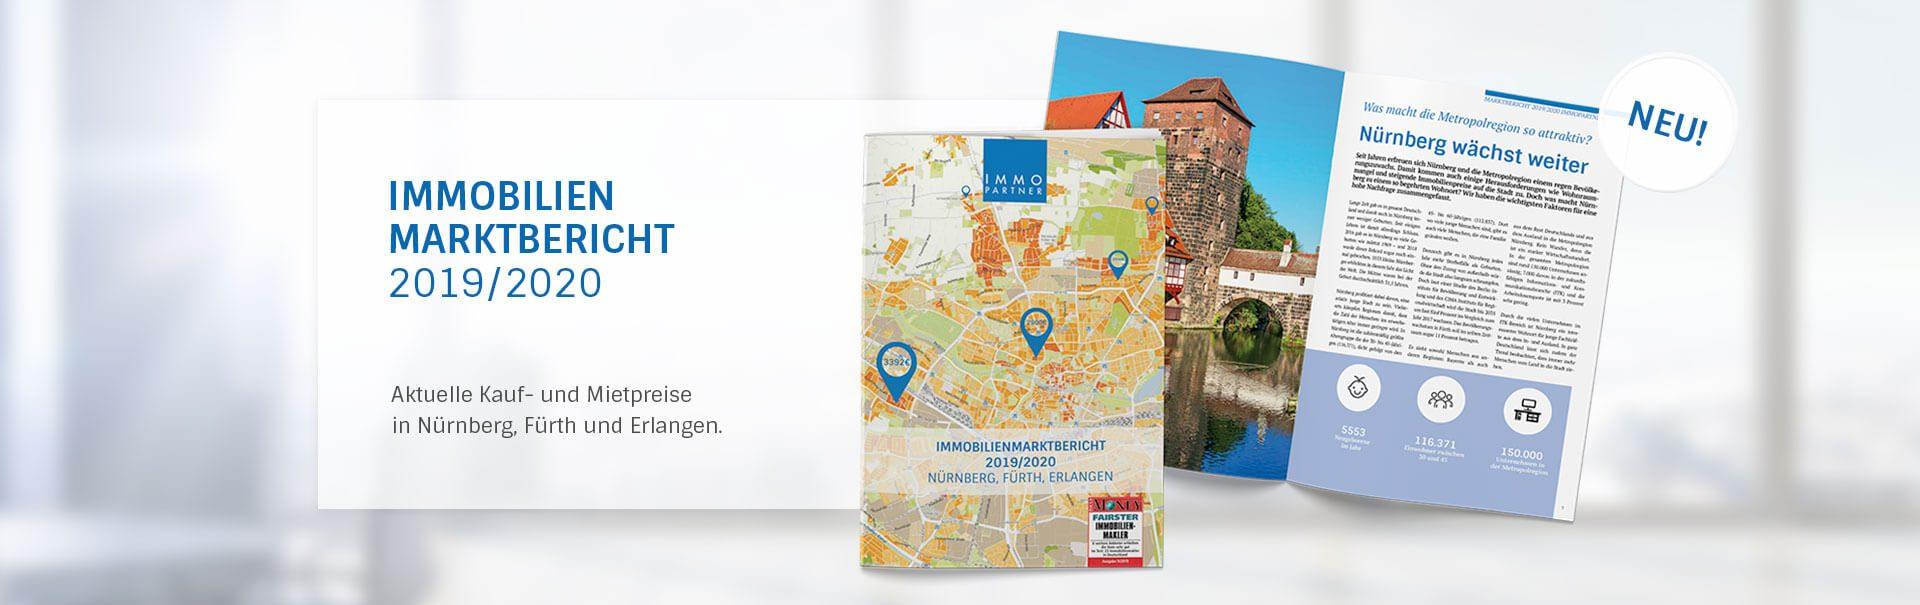 IMMO-PARTNER_Header_Marktbericht_